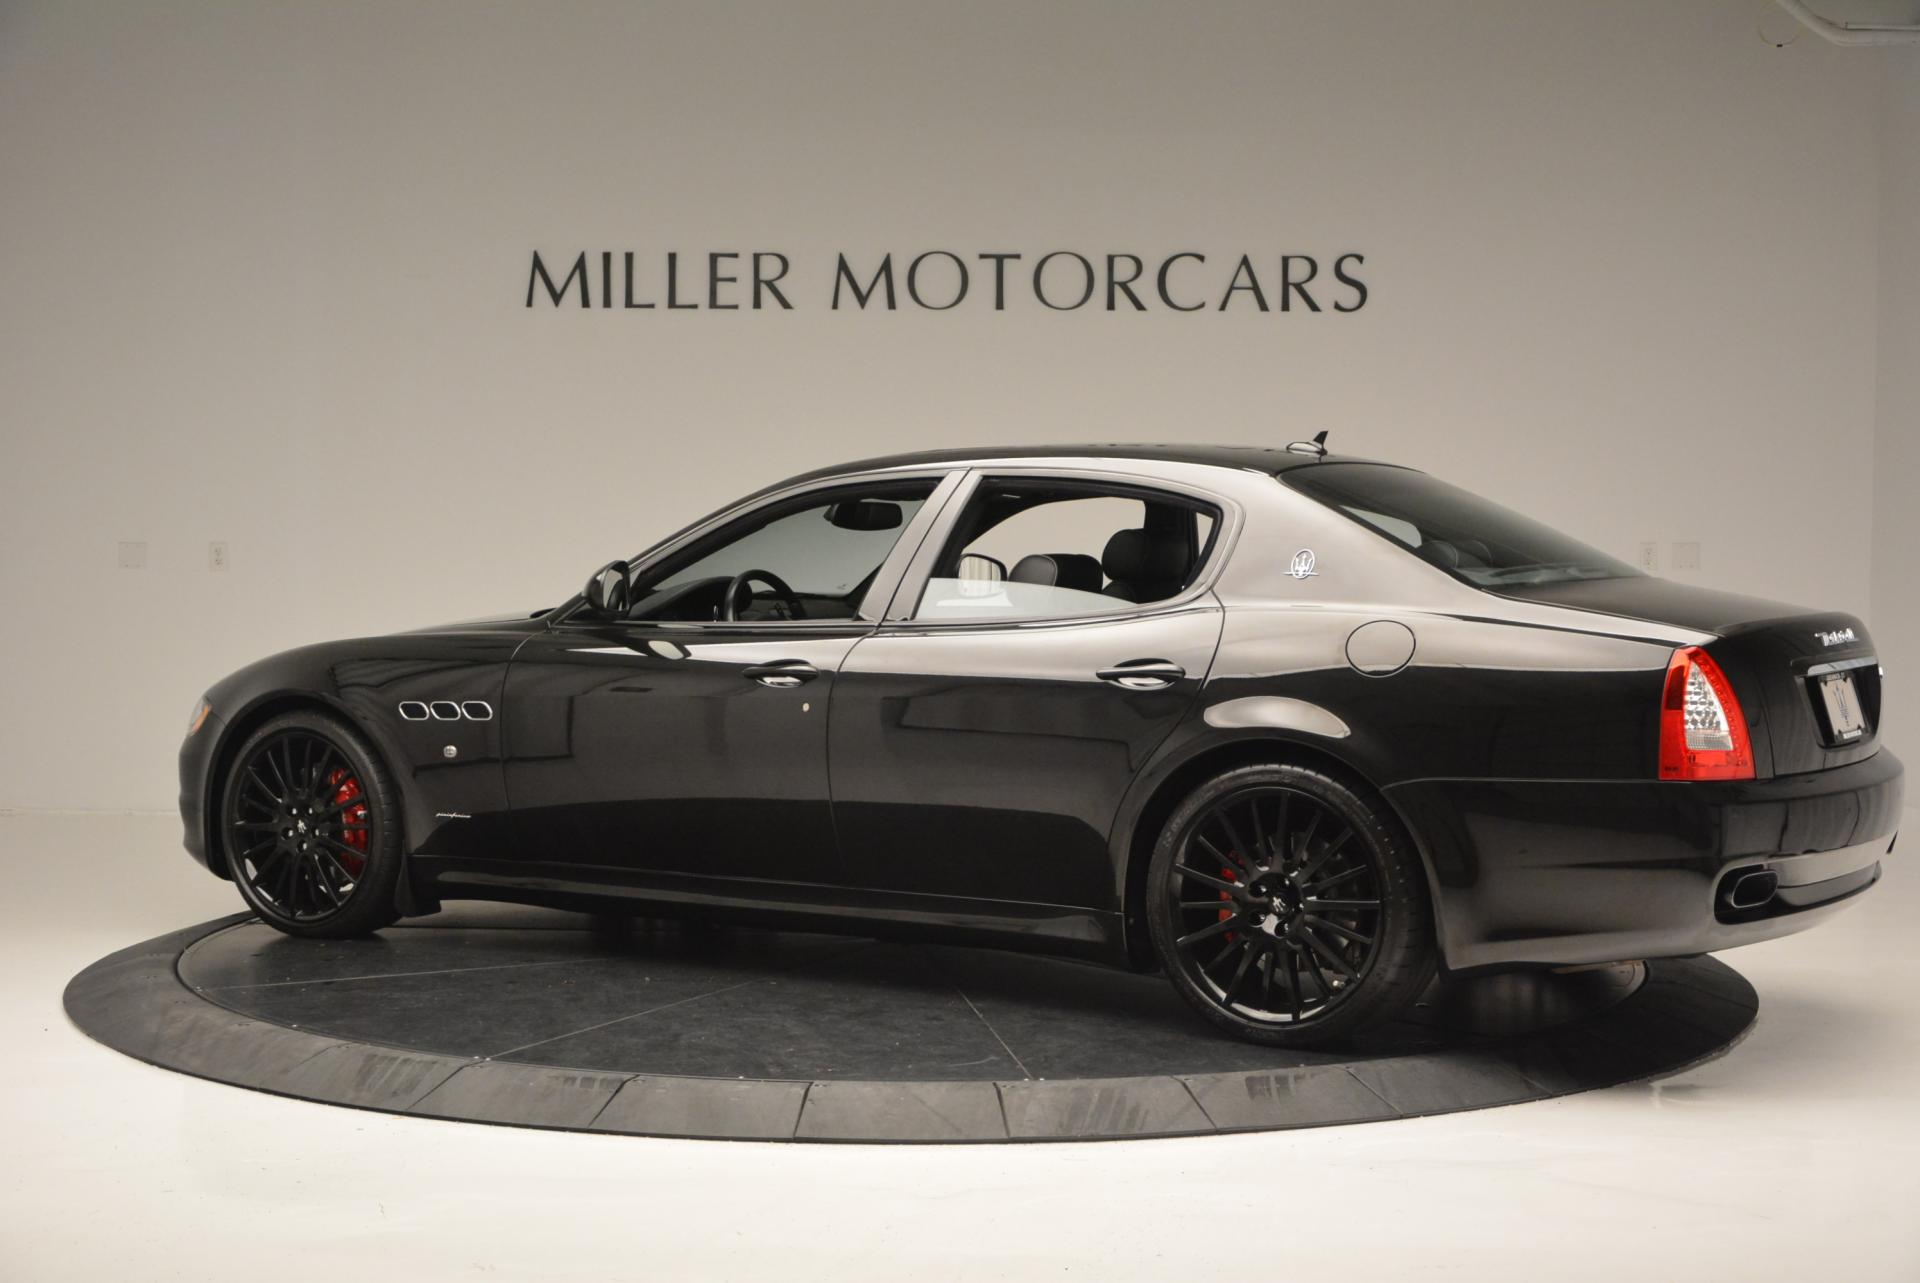 https://www.millermotorcars.com/galleria_images/531/531_p4_l.jpg